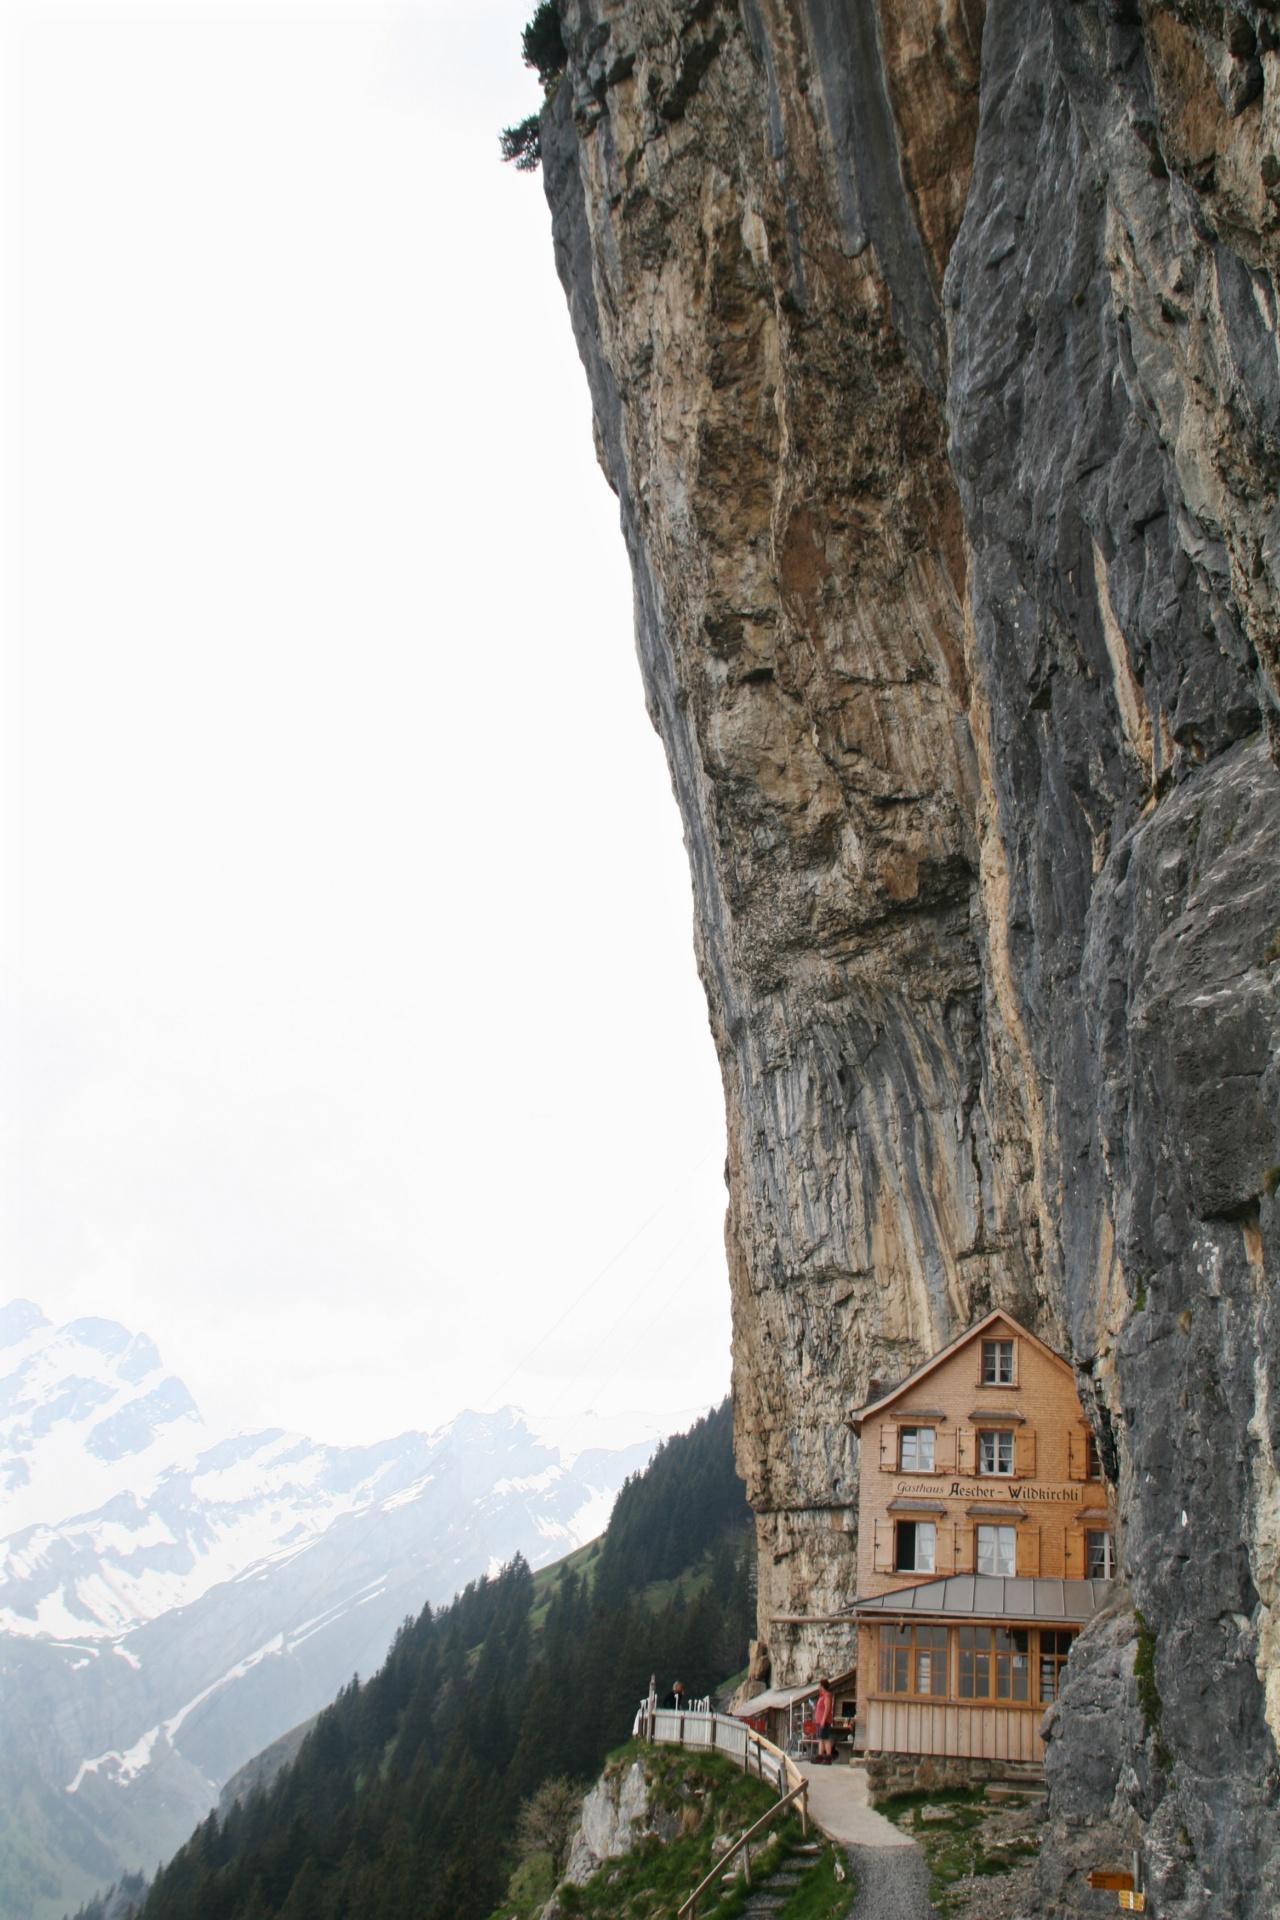 Switzerland scenes, with switzerlandtr0803